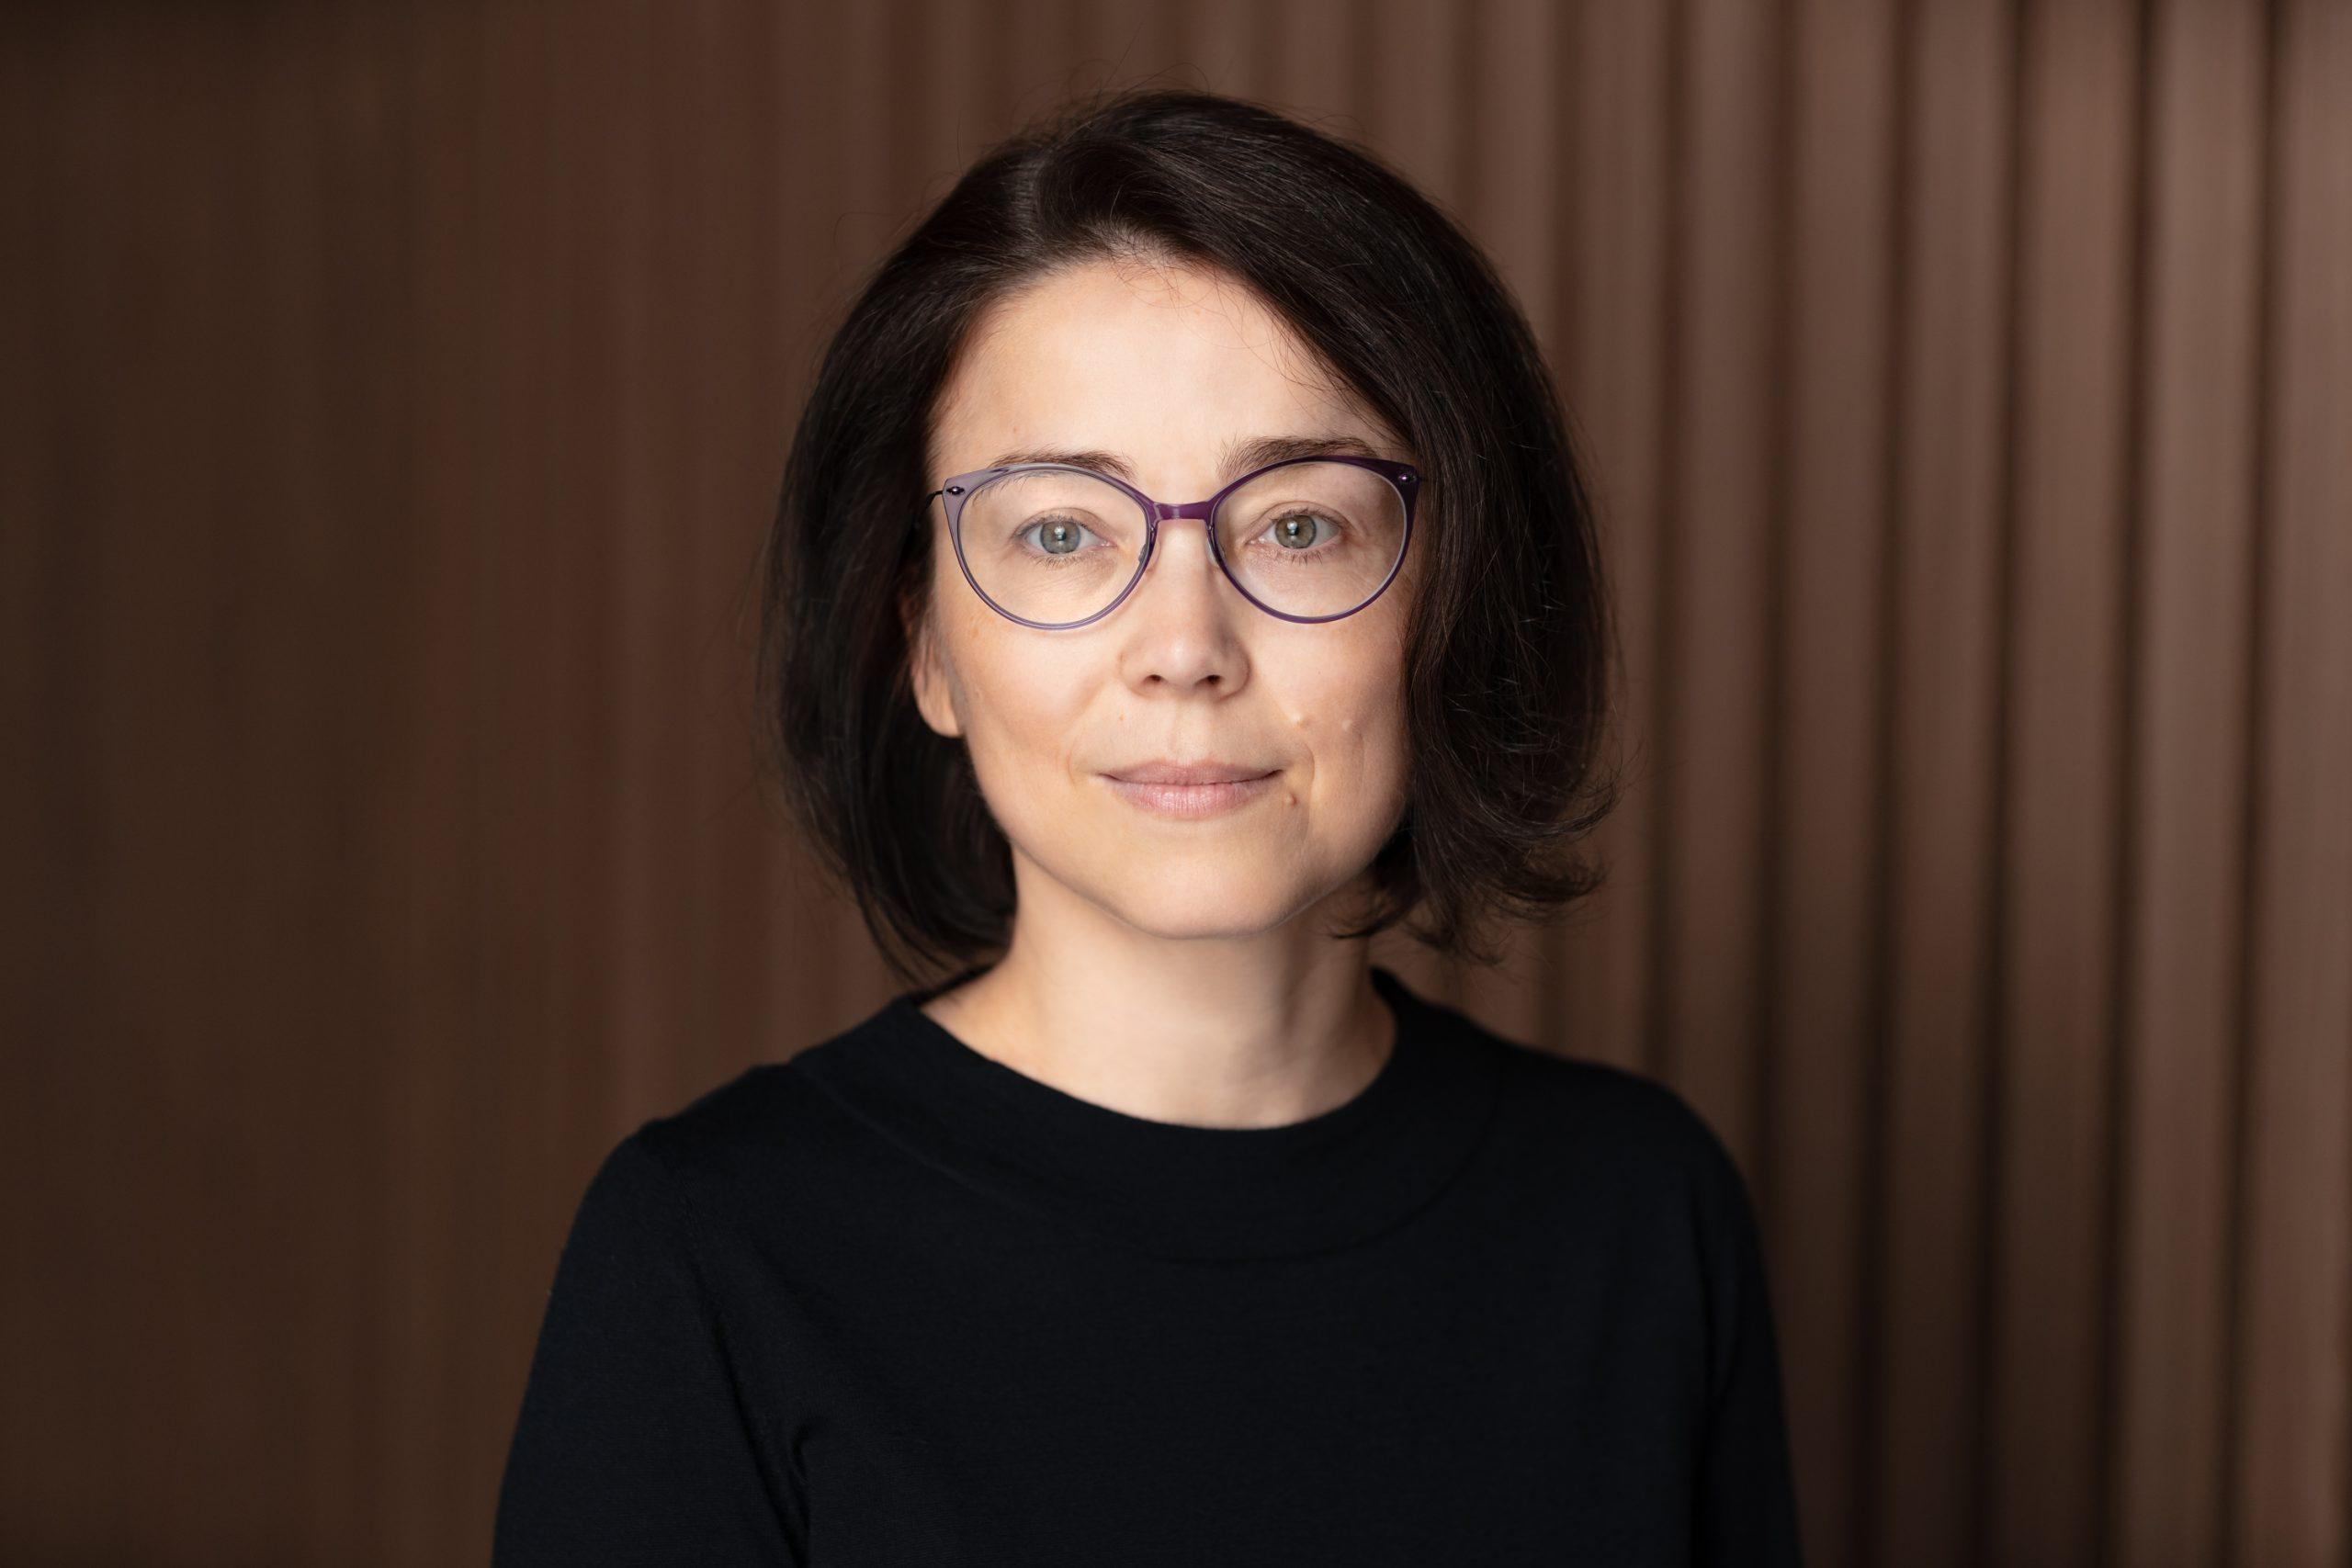 Cristina Filip